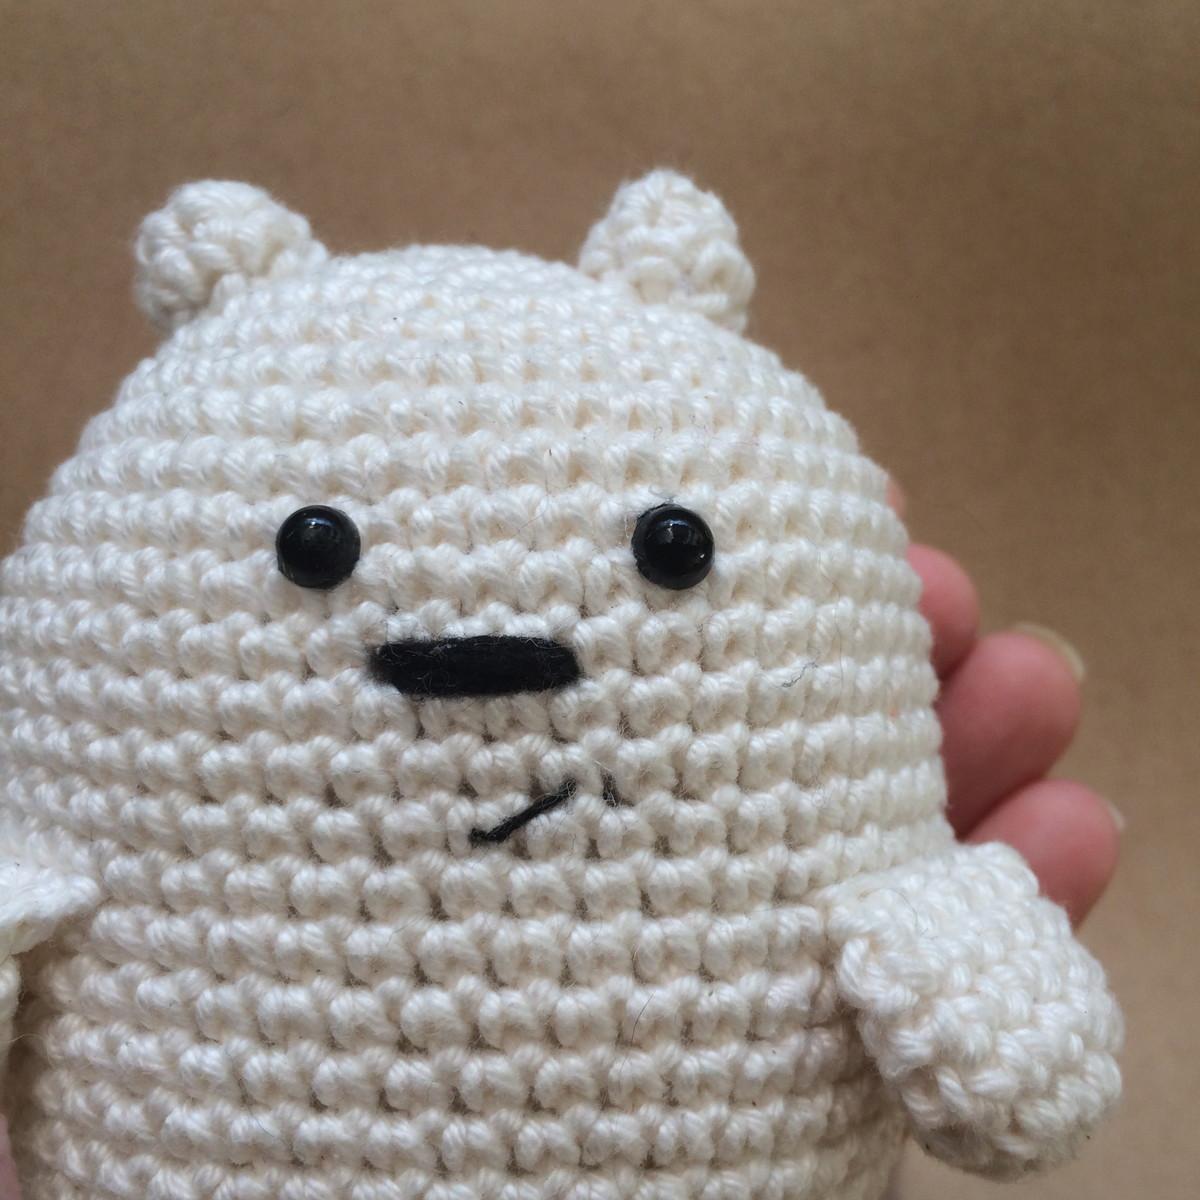 Amigurumi Crochet Colorful Cute Keychain WE BARE BEARS | Shopee ... | 1200x1200